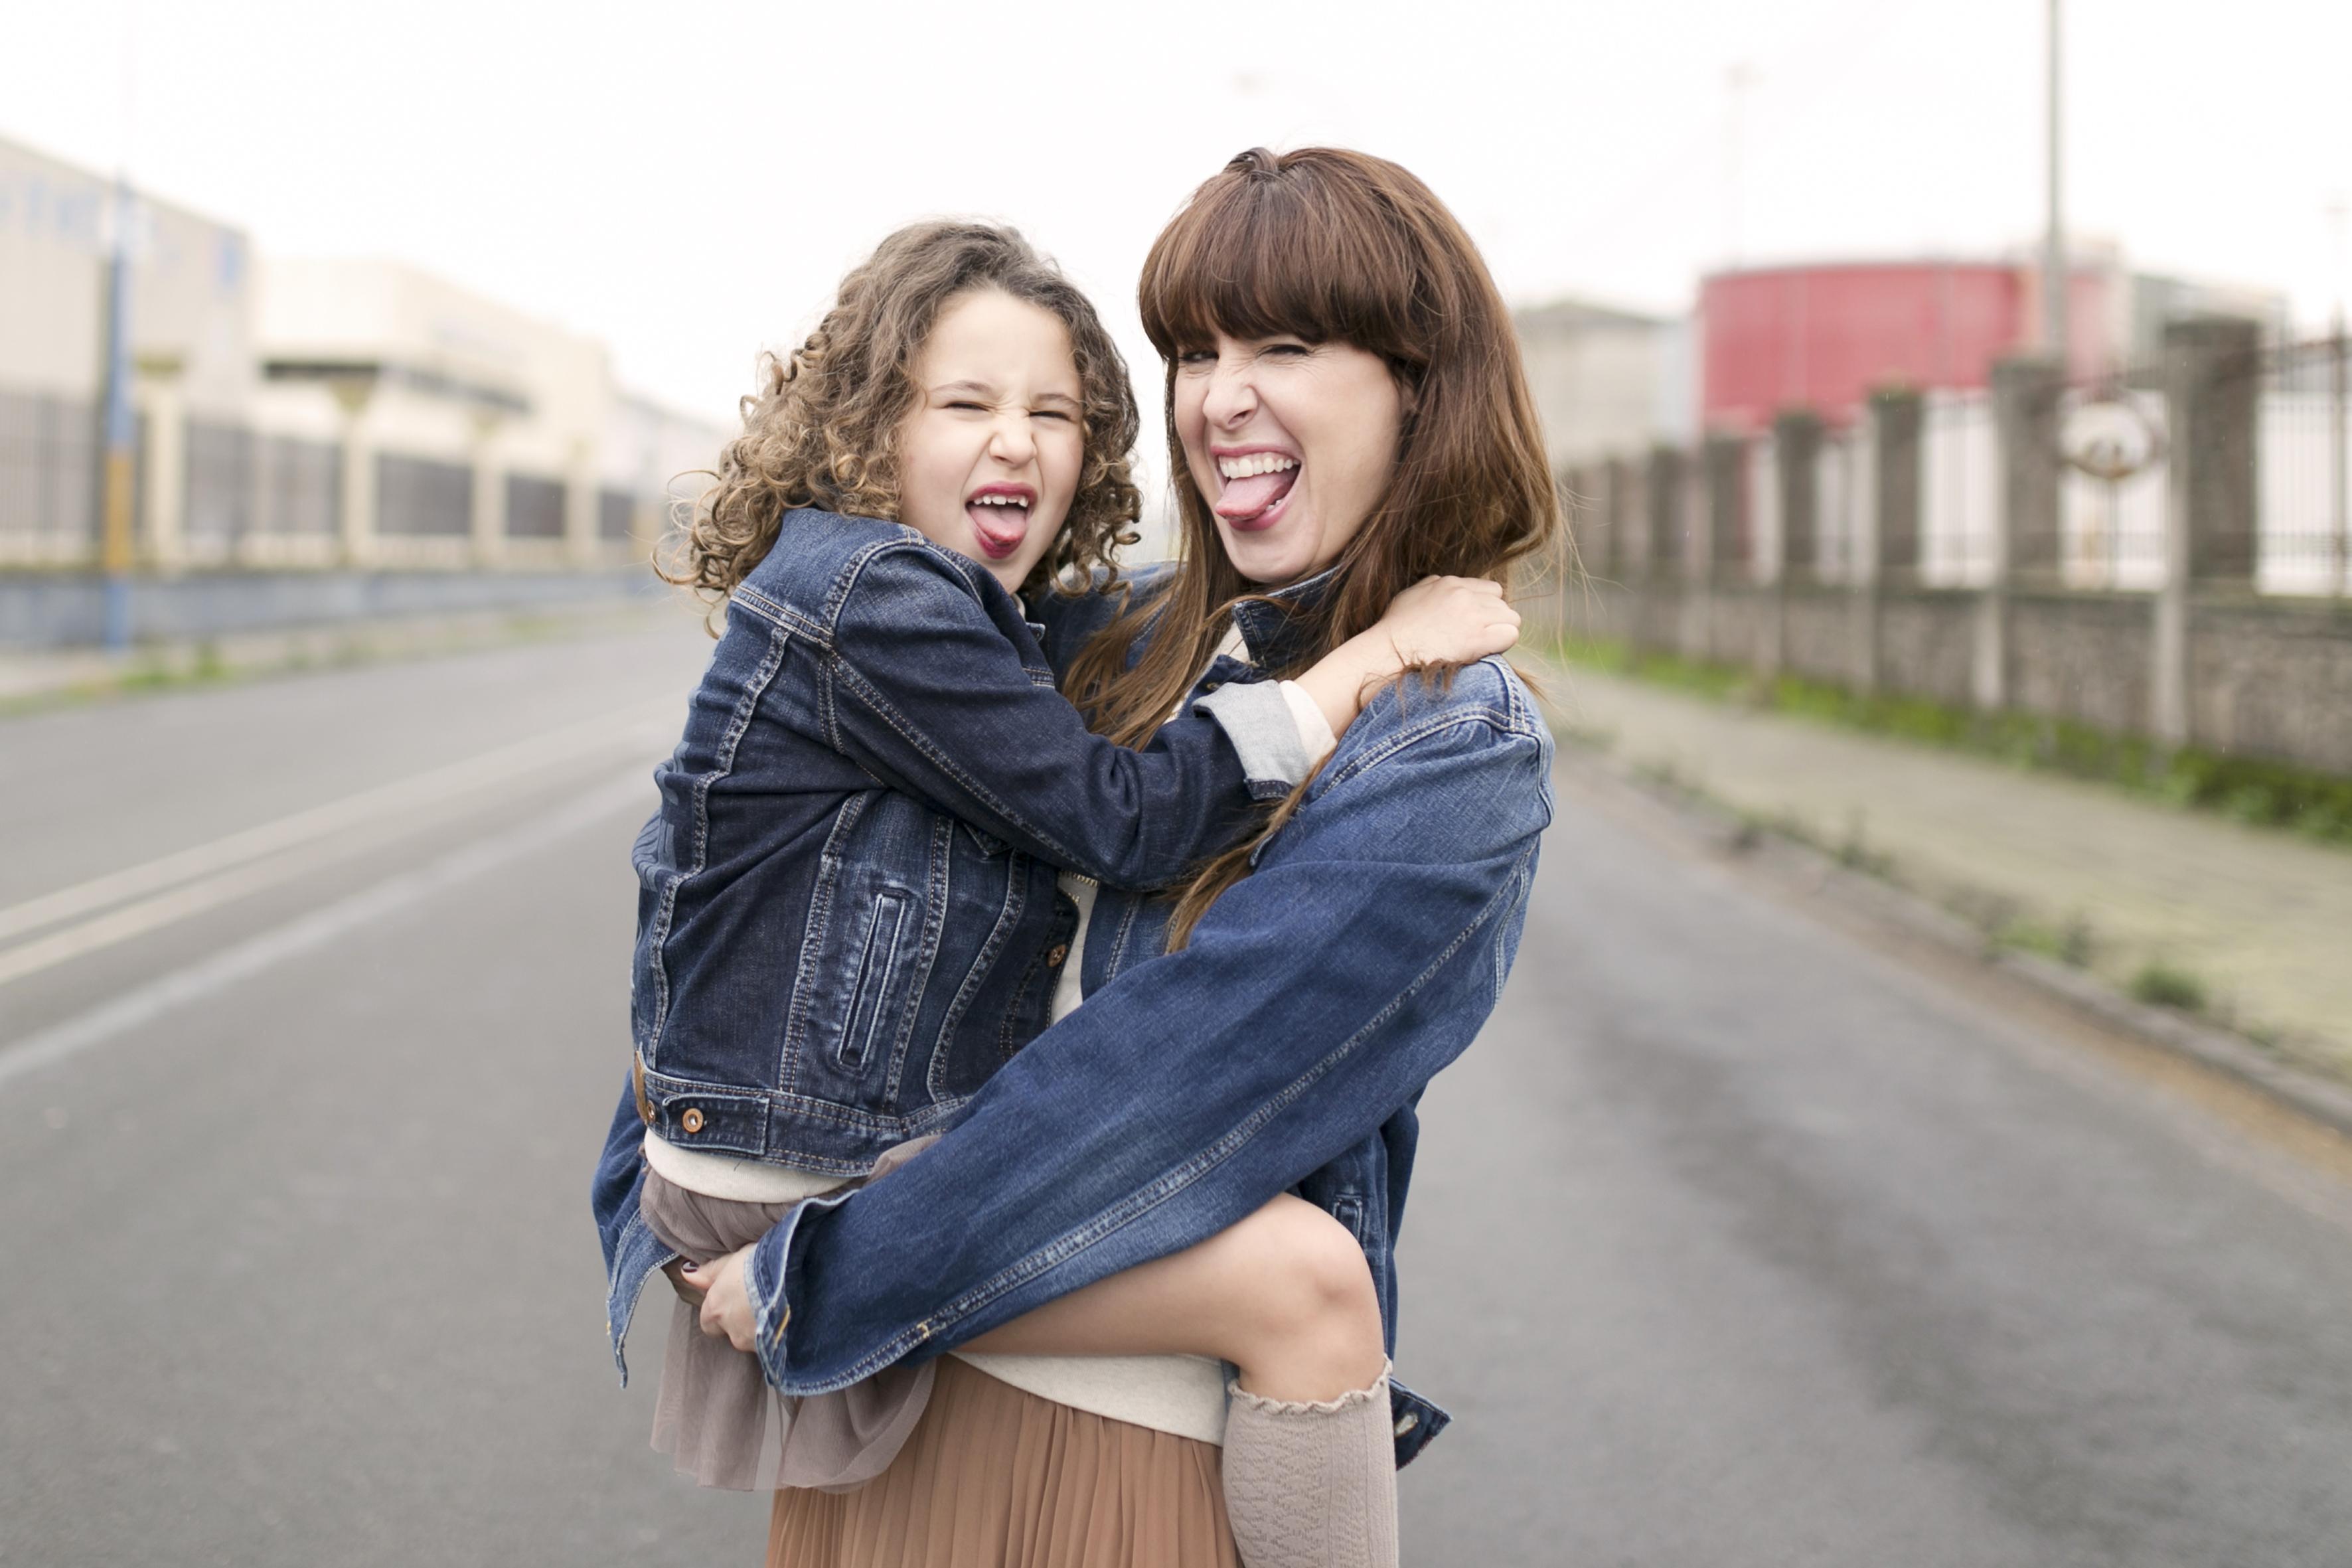 Coruña-family-smile-madre e hija-streetstyle- descalzaporelparque-denim-pepejeans-denim jacket-minime-blogger-madre e hija-zara- zarakids-